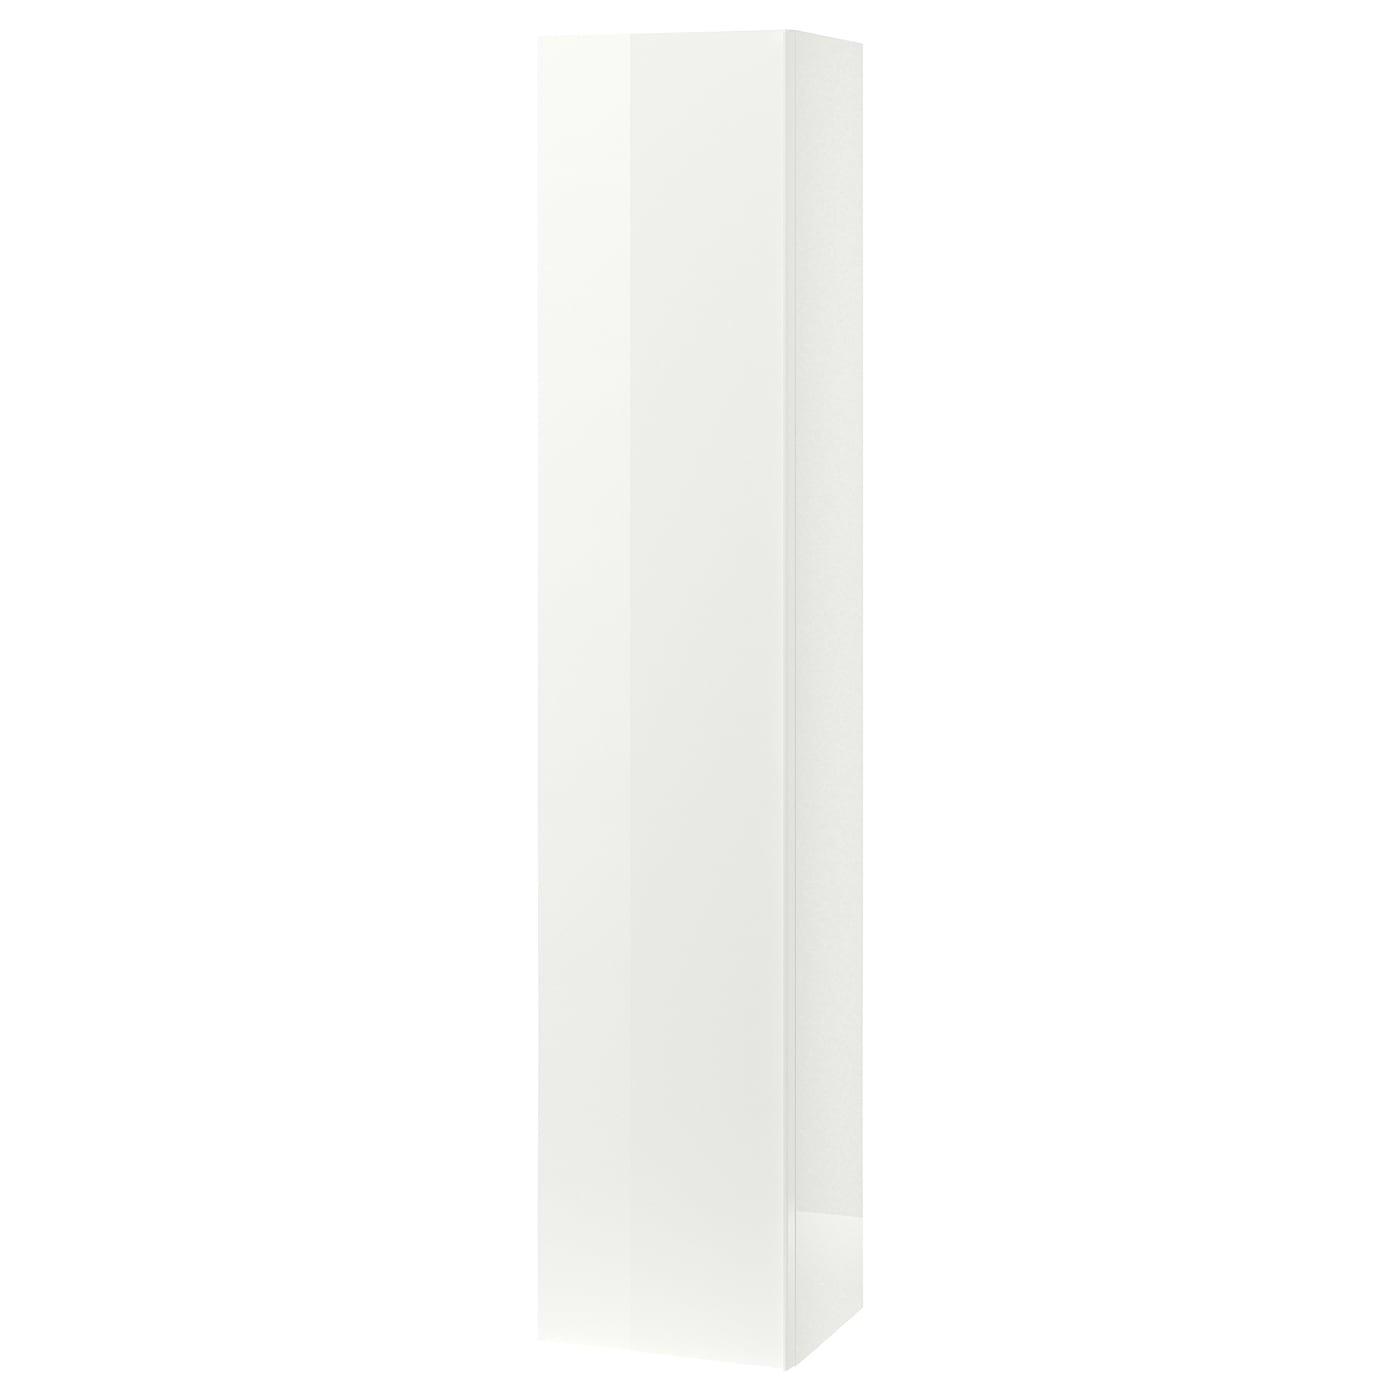 Ikea Badmöbel Godmorgon Grau